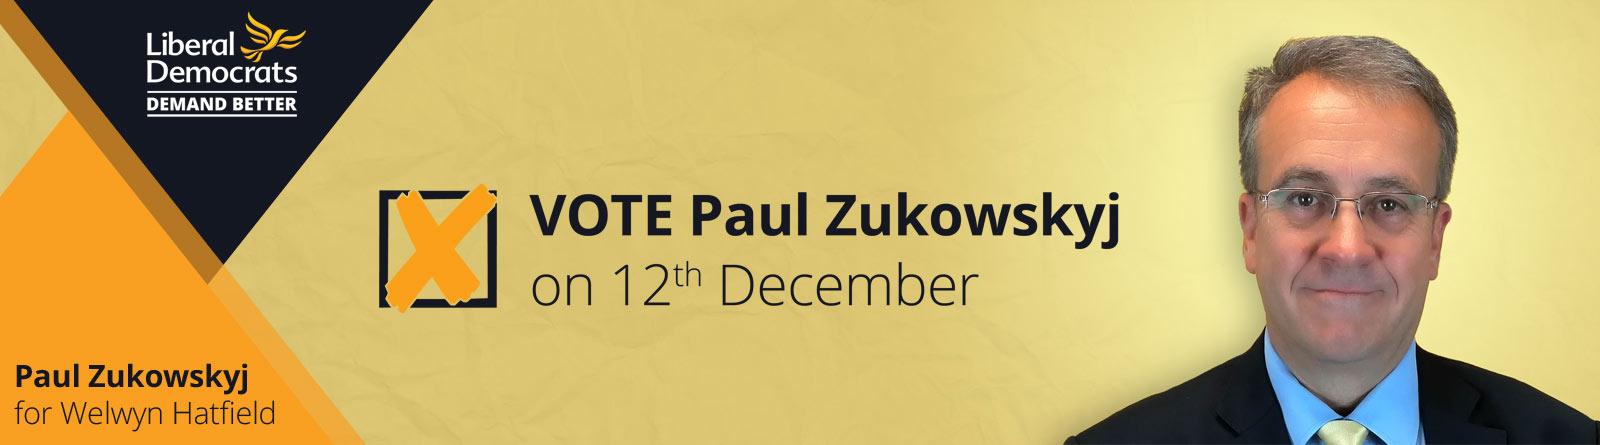 Vote Paul Zukowskyj on 12th December